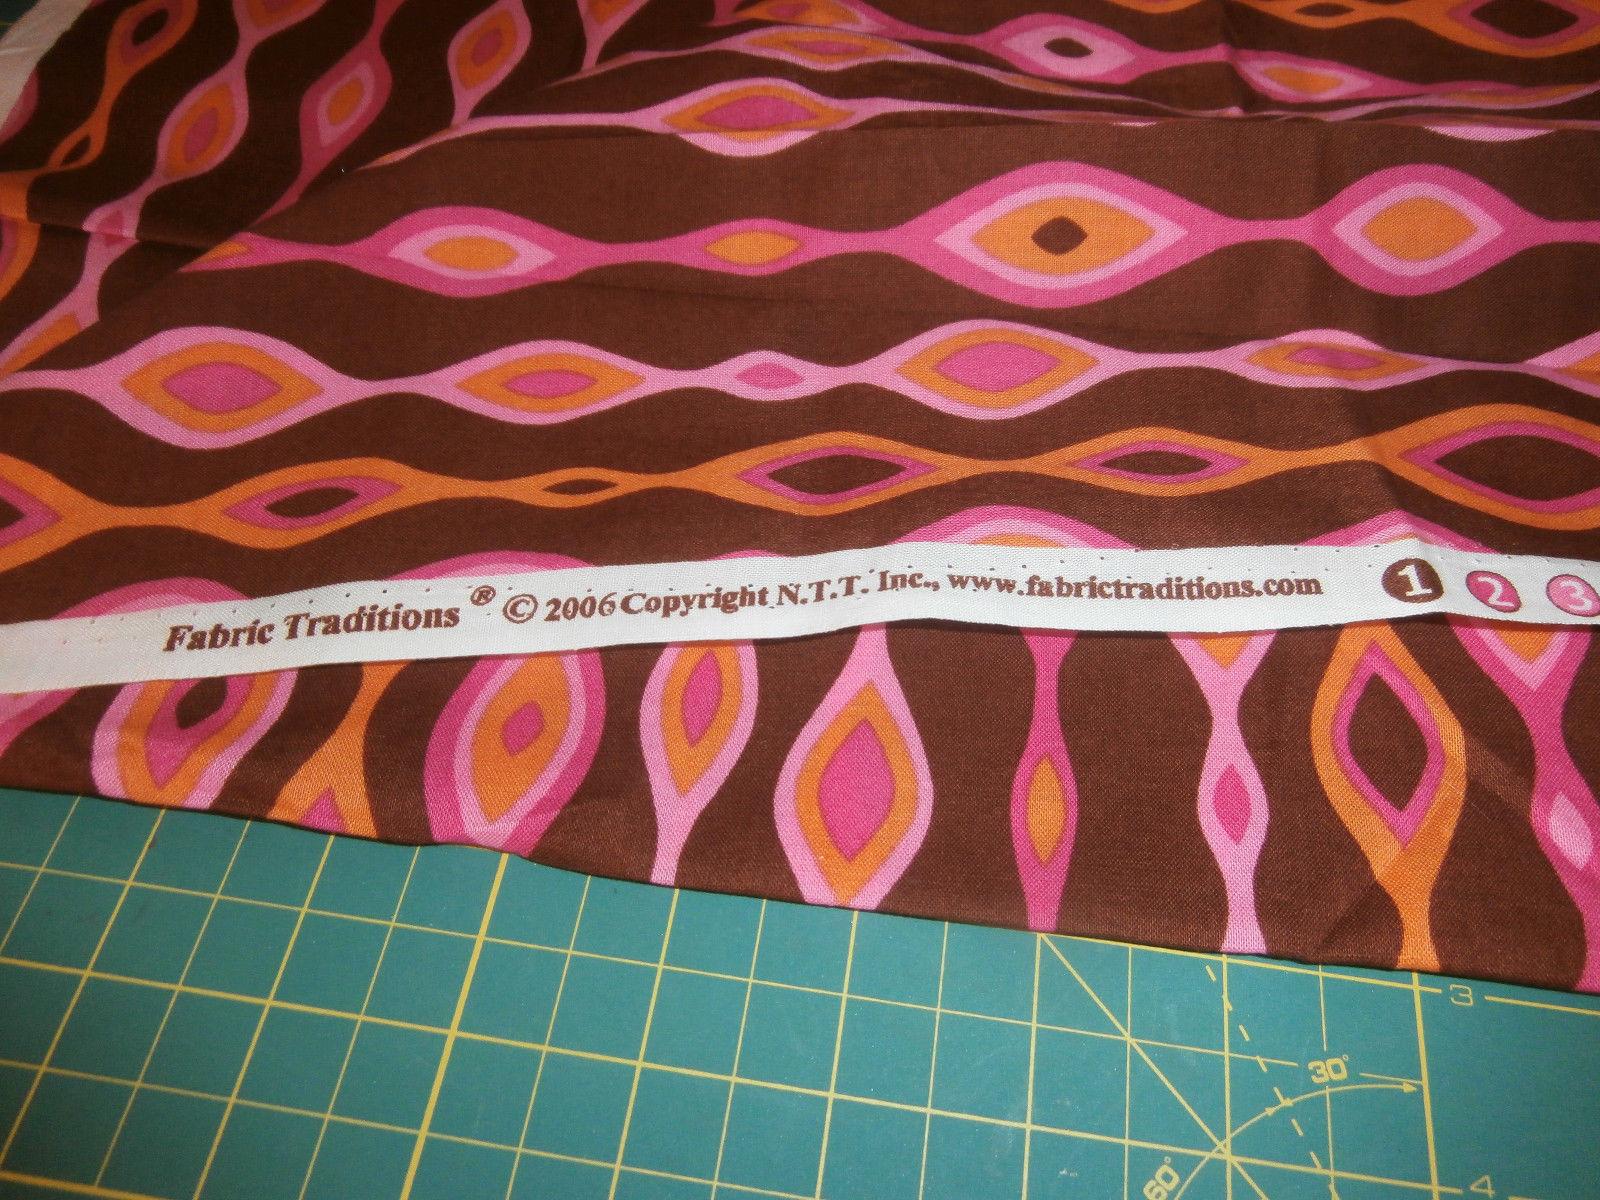 1 Yard Fabric Traditions 100% Cotton Brown Pink Orange Geometric